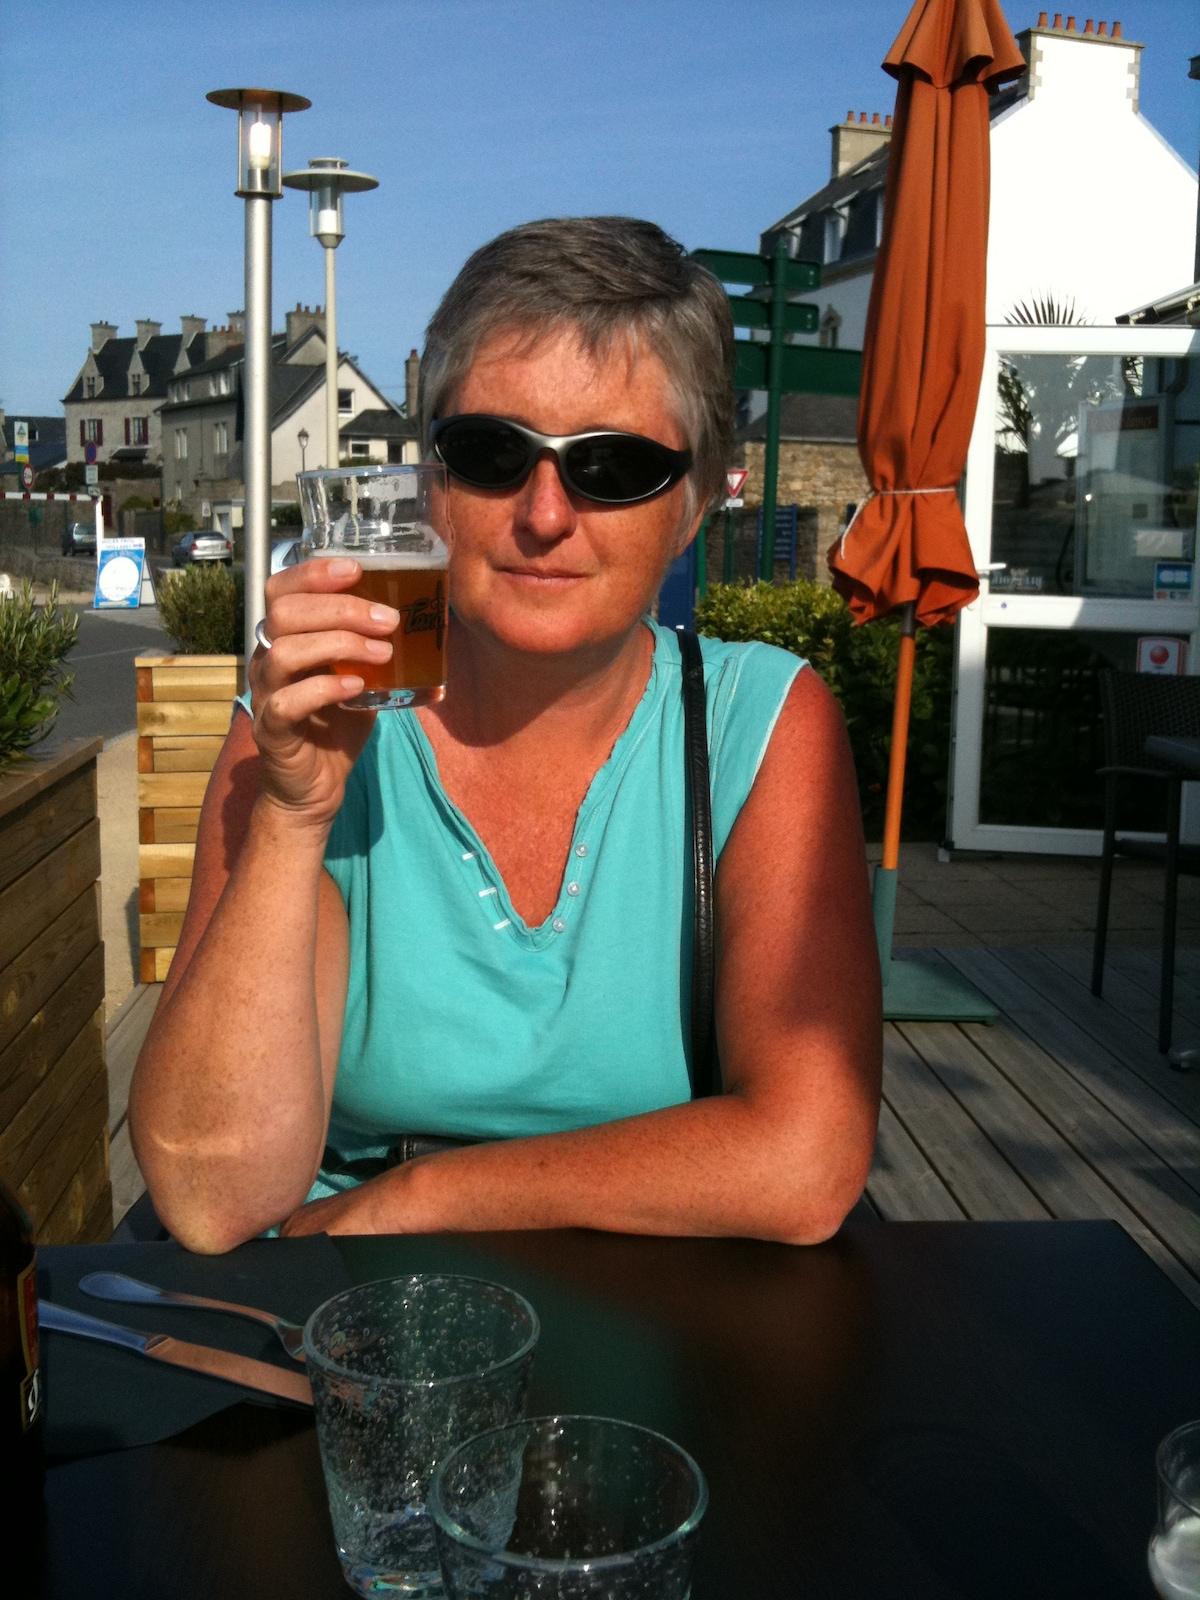 Gillian From Galway, Ireland